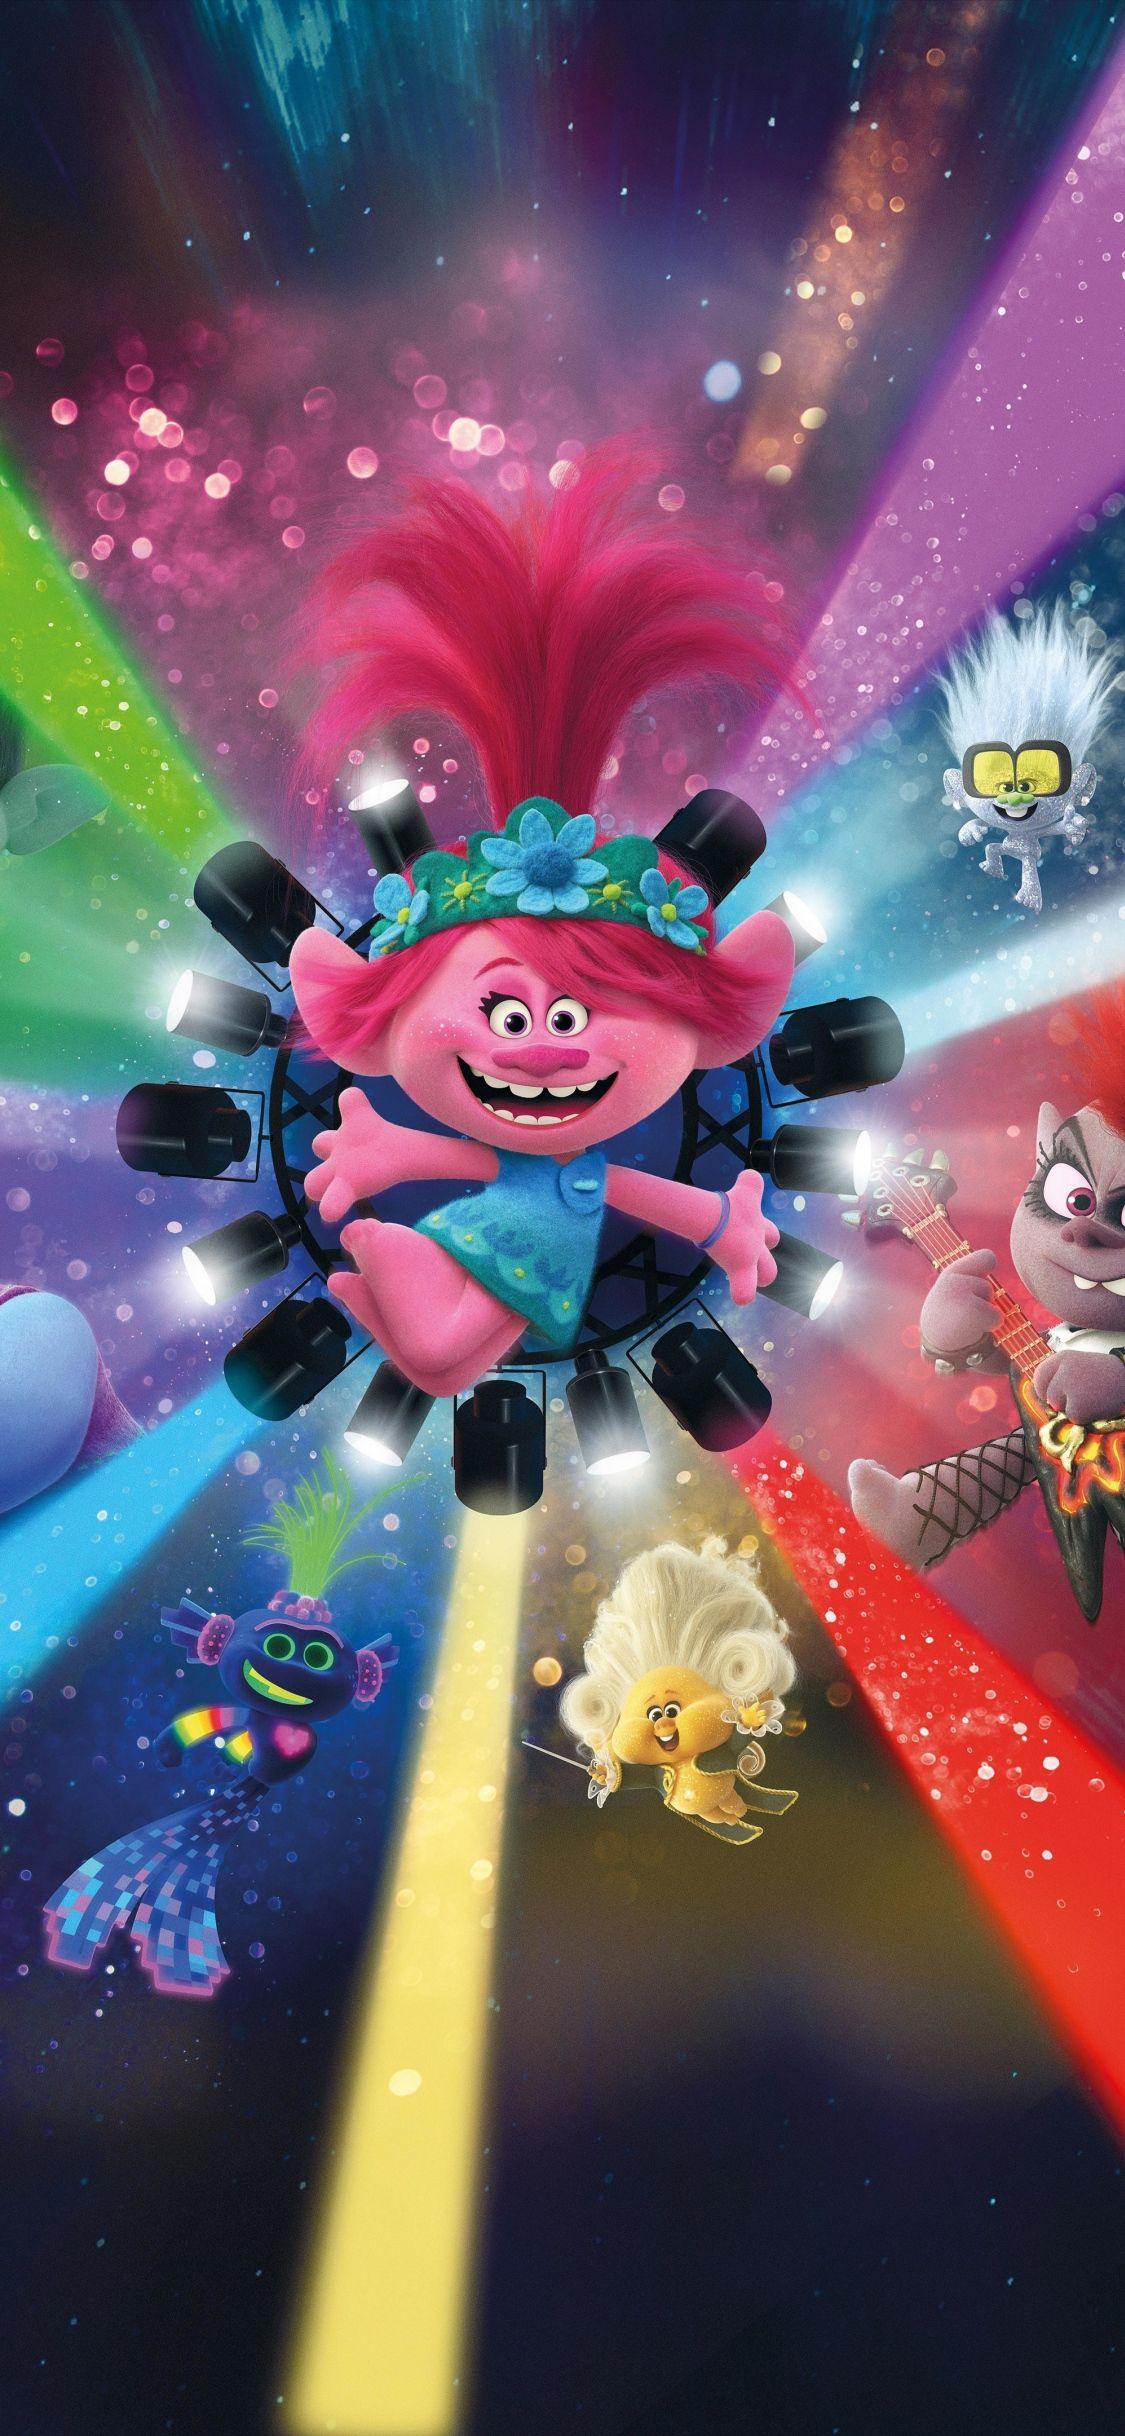 1125x2436 Trolls World Tour, 2020 animation movie